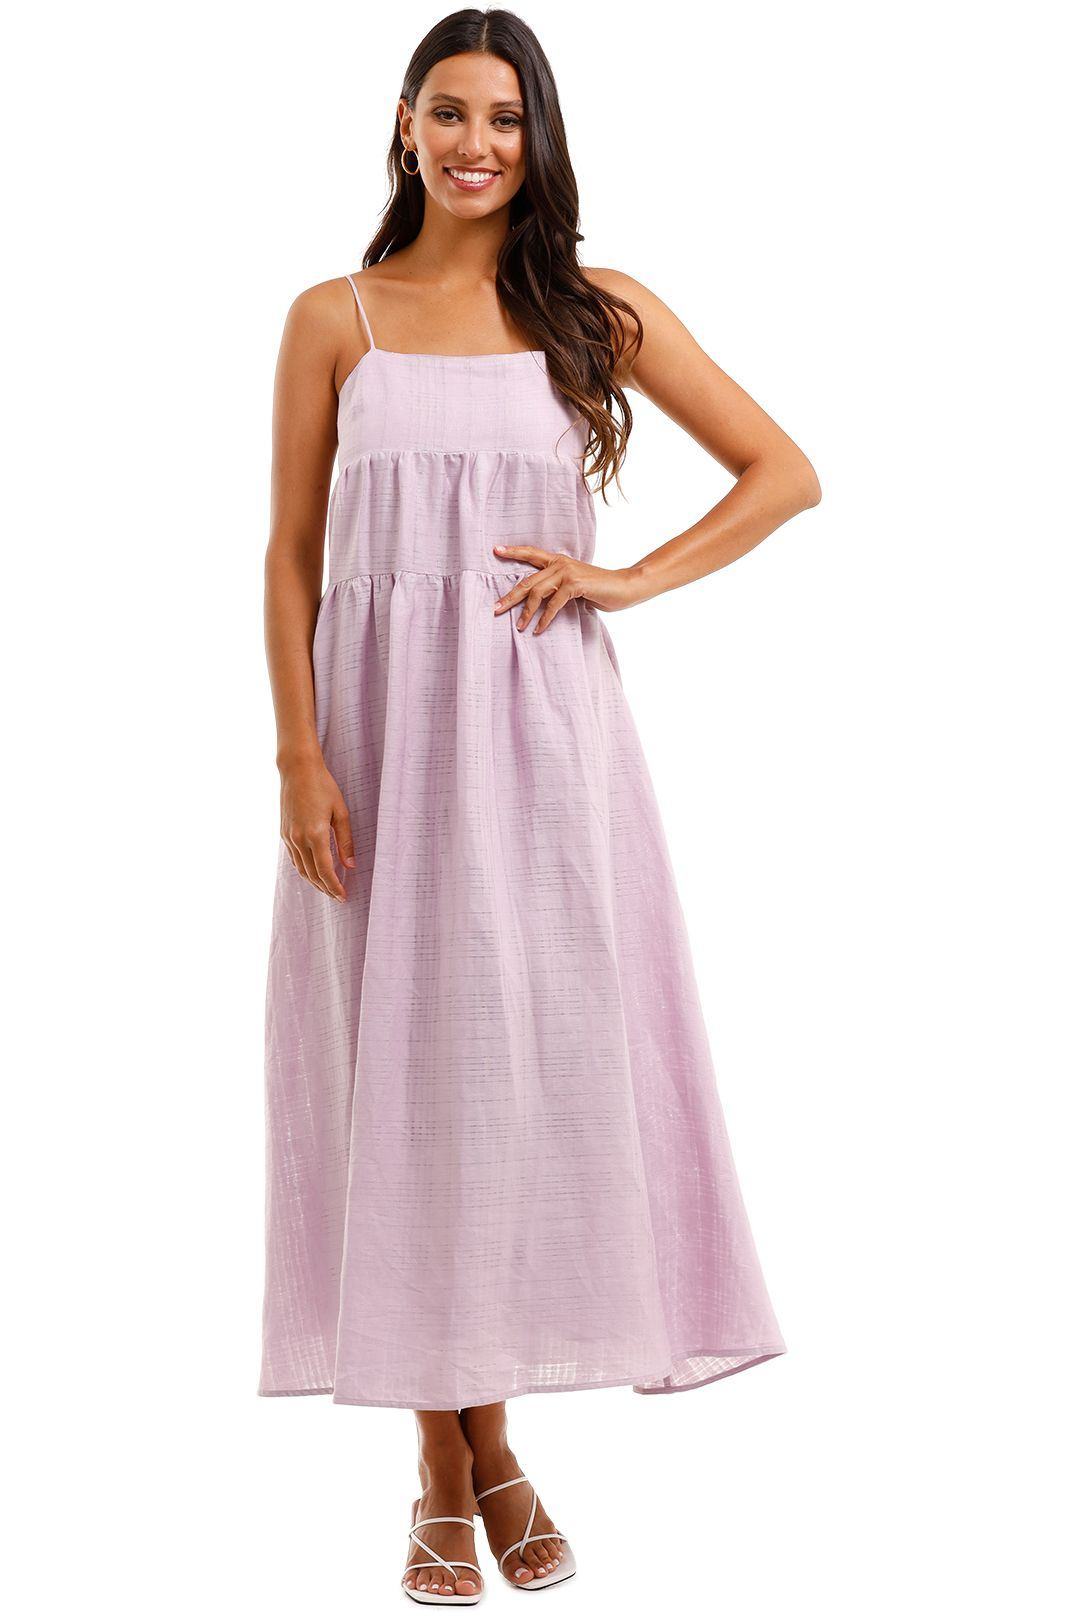 Country Road Textured Slip Dress Purple